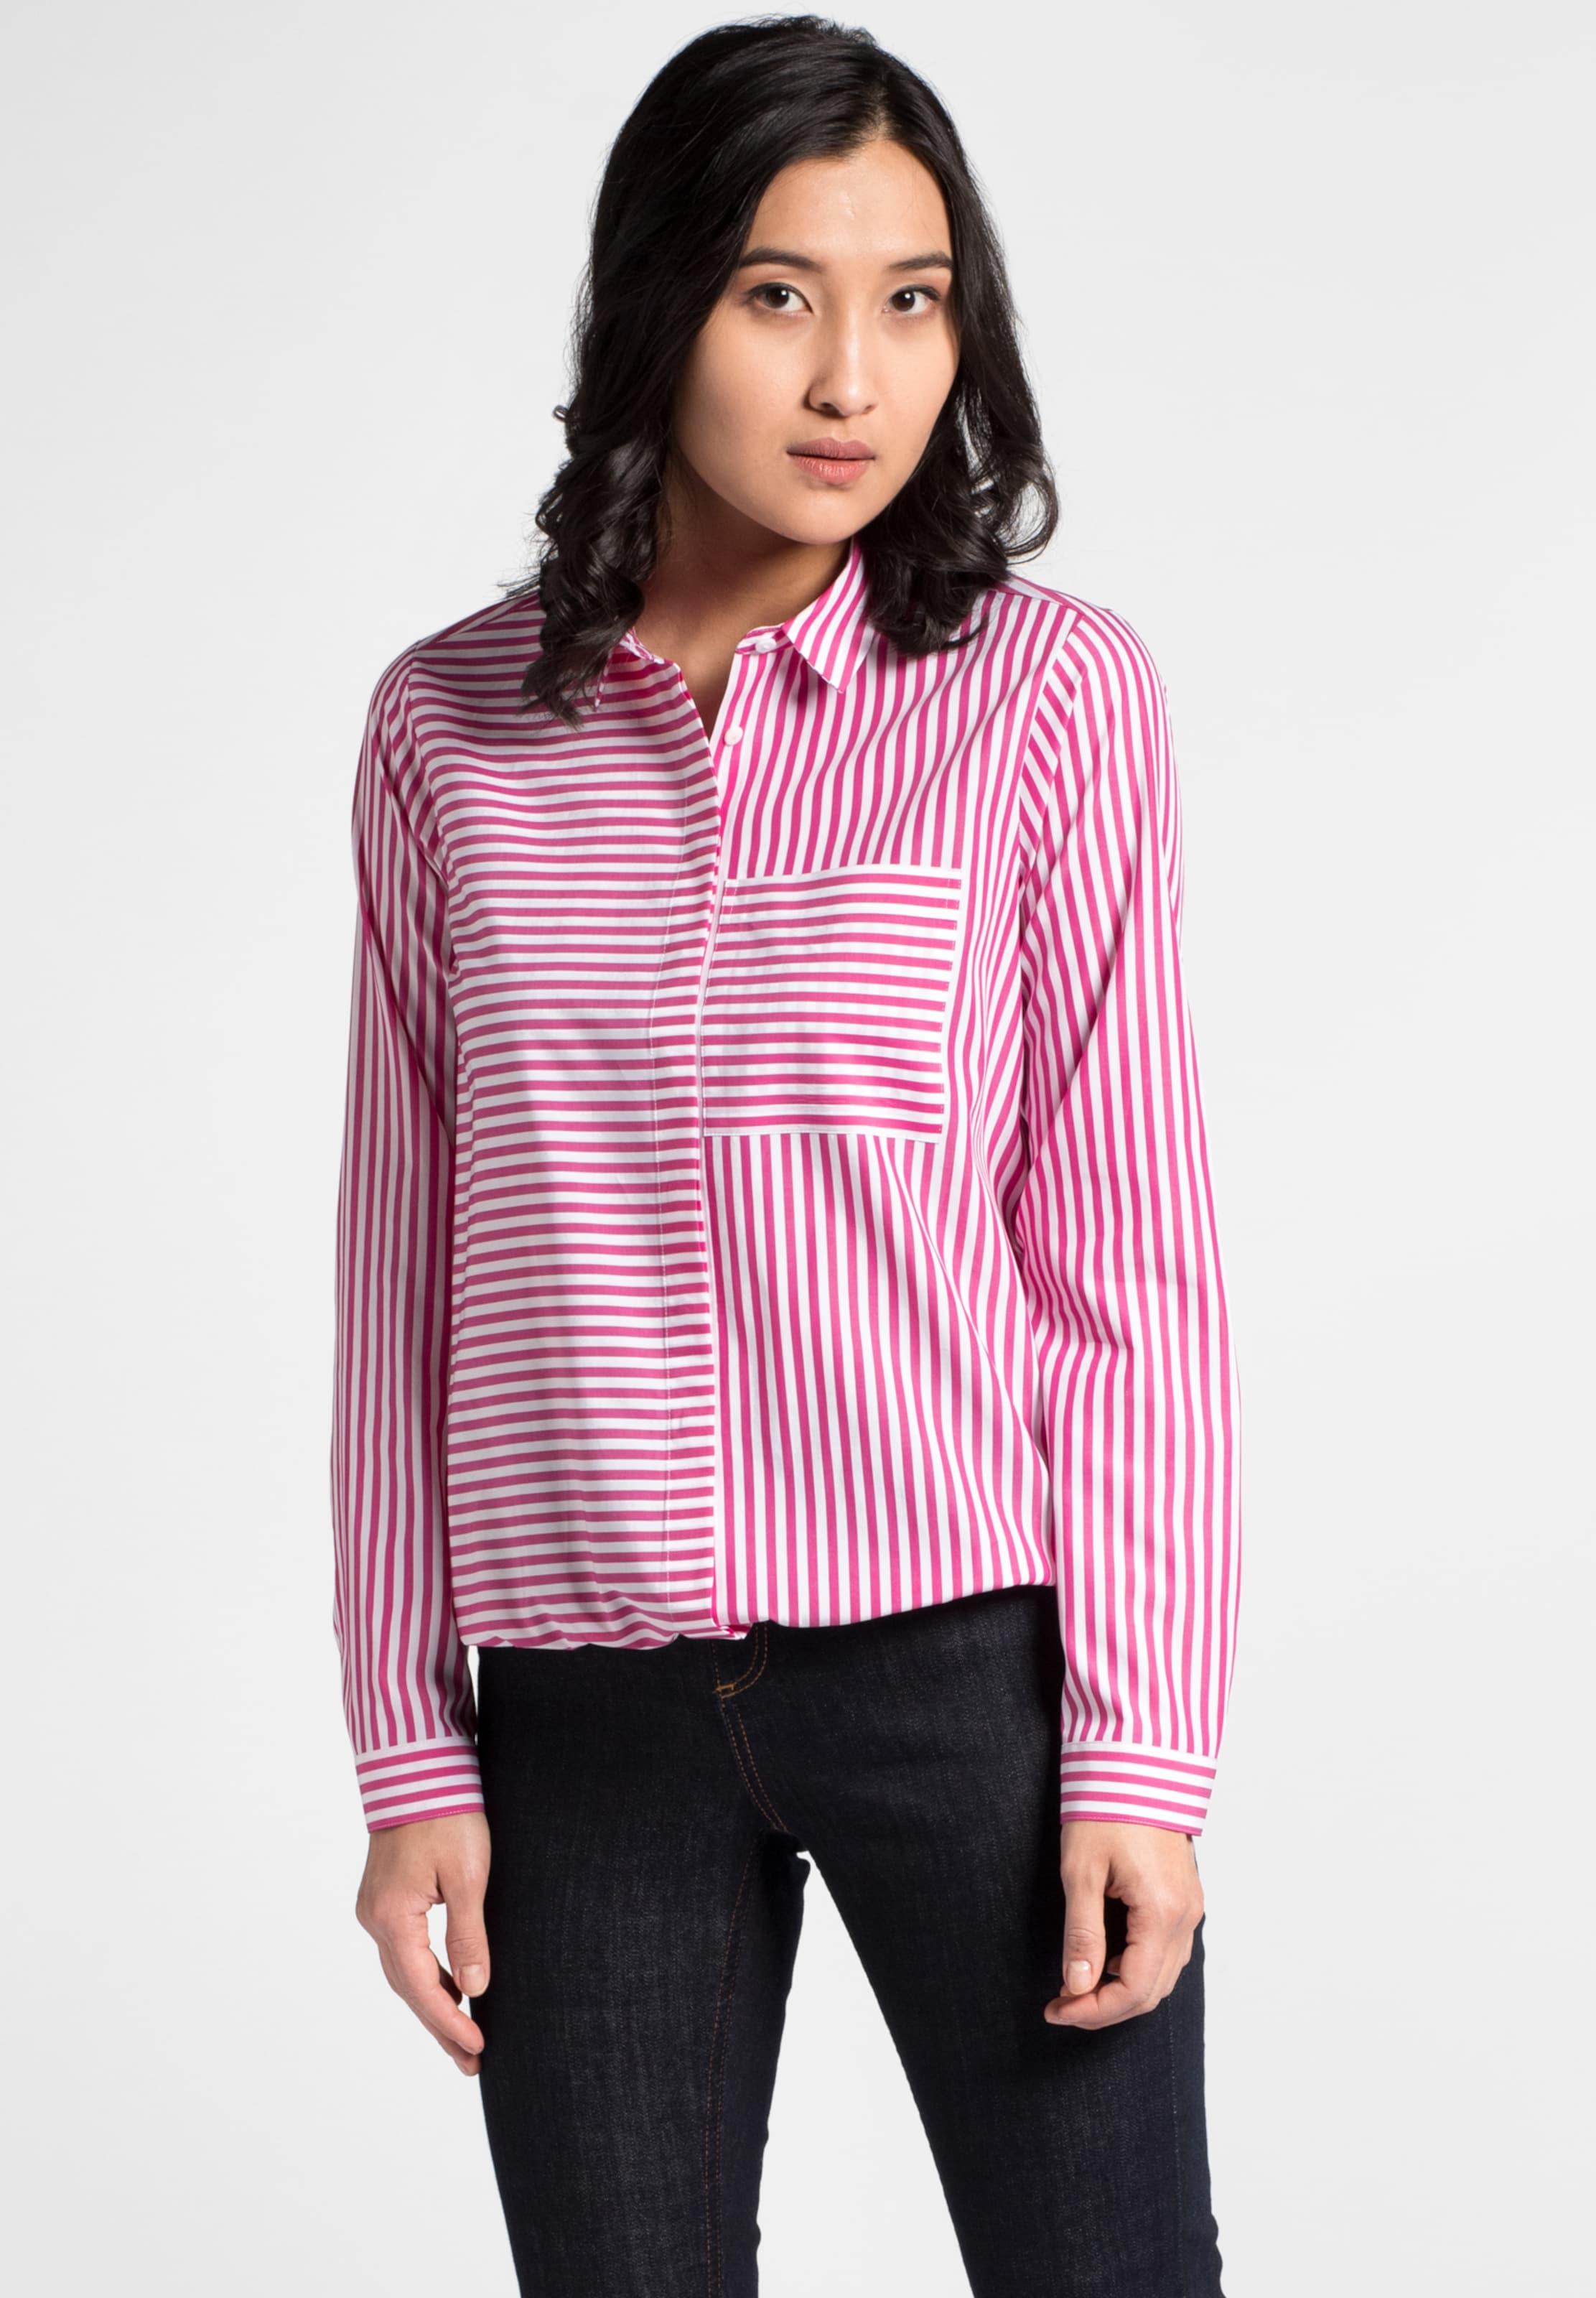 PinkWeiß Eterna In Eterna PinkWeiß Bluse Bluse In E9IYHW2D